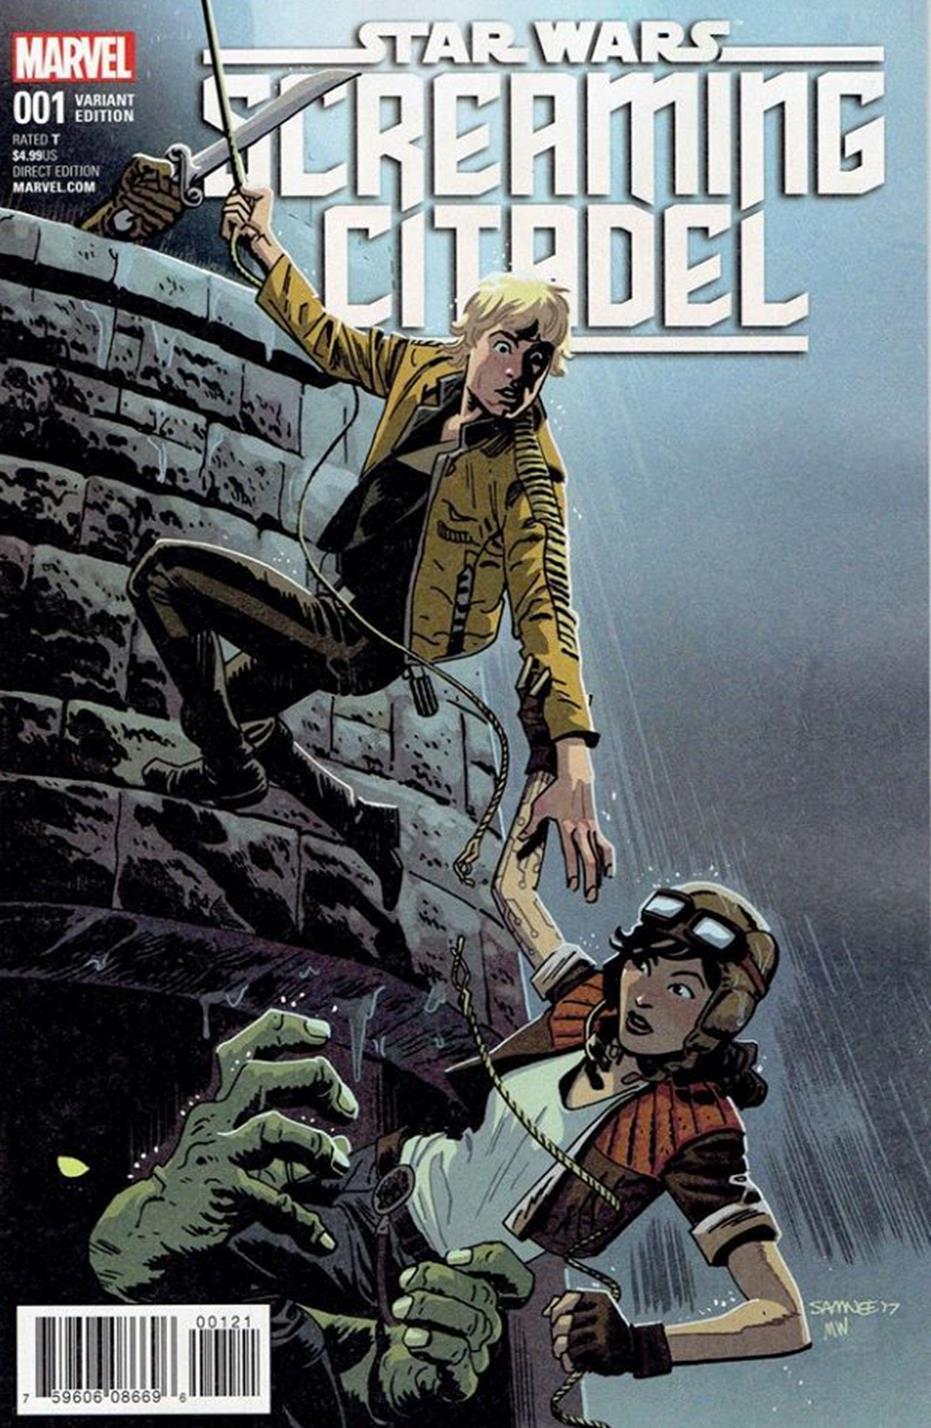 The Screaming Citadel #1 (Chris Samnee Variant Cover) (10.05.2017)